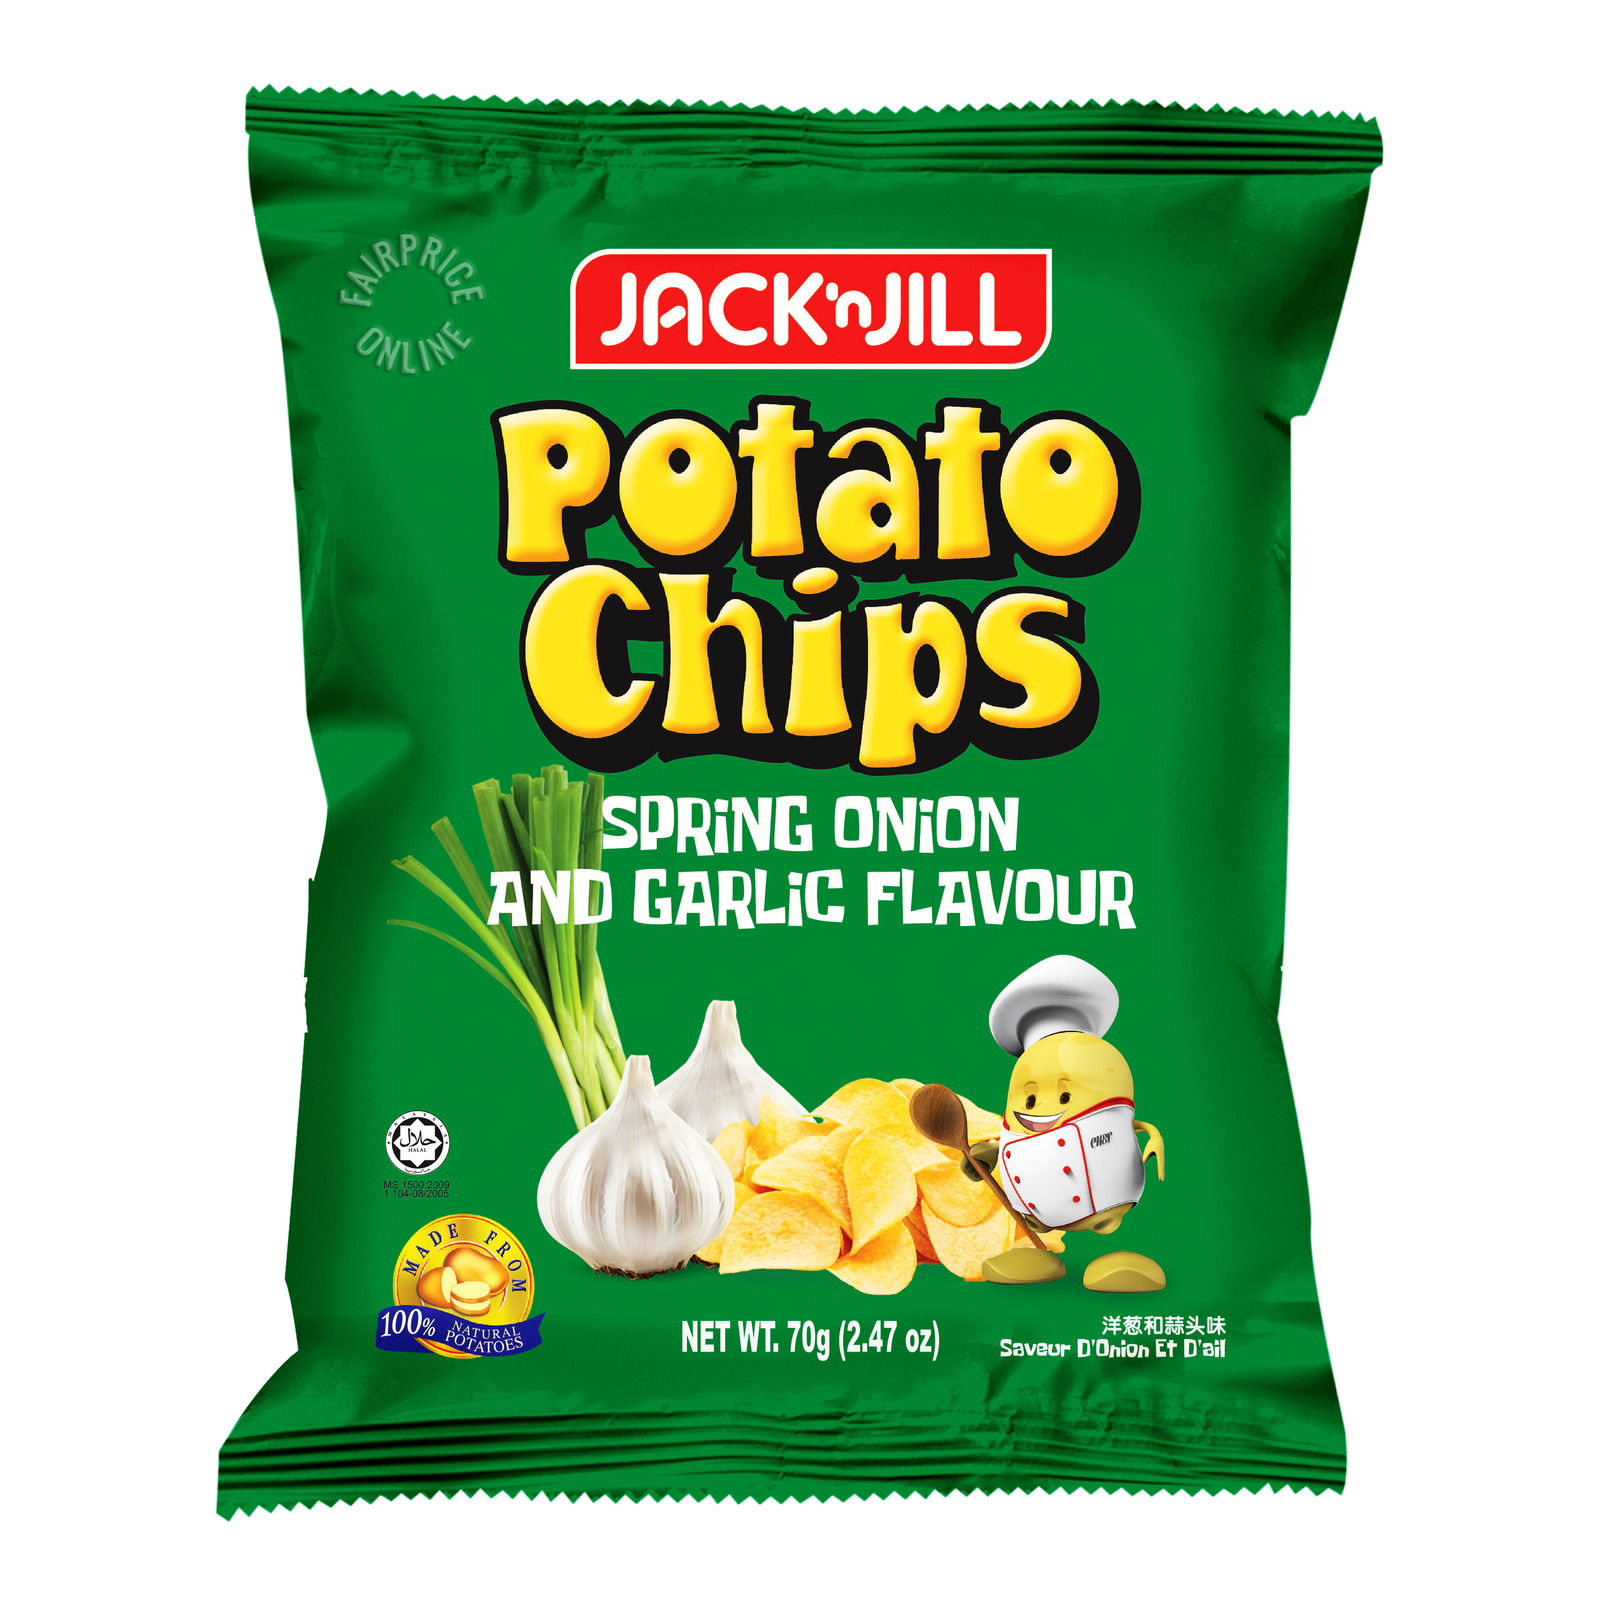 Jack 'n Jill Potato Chips - Spring Onion